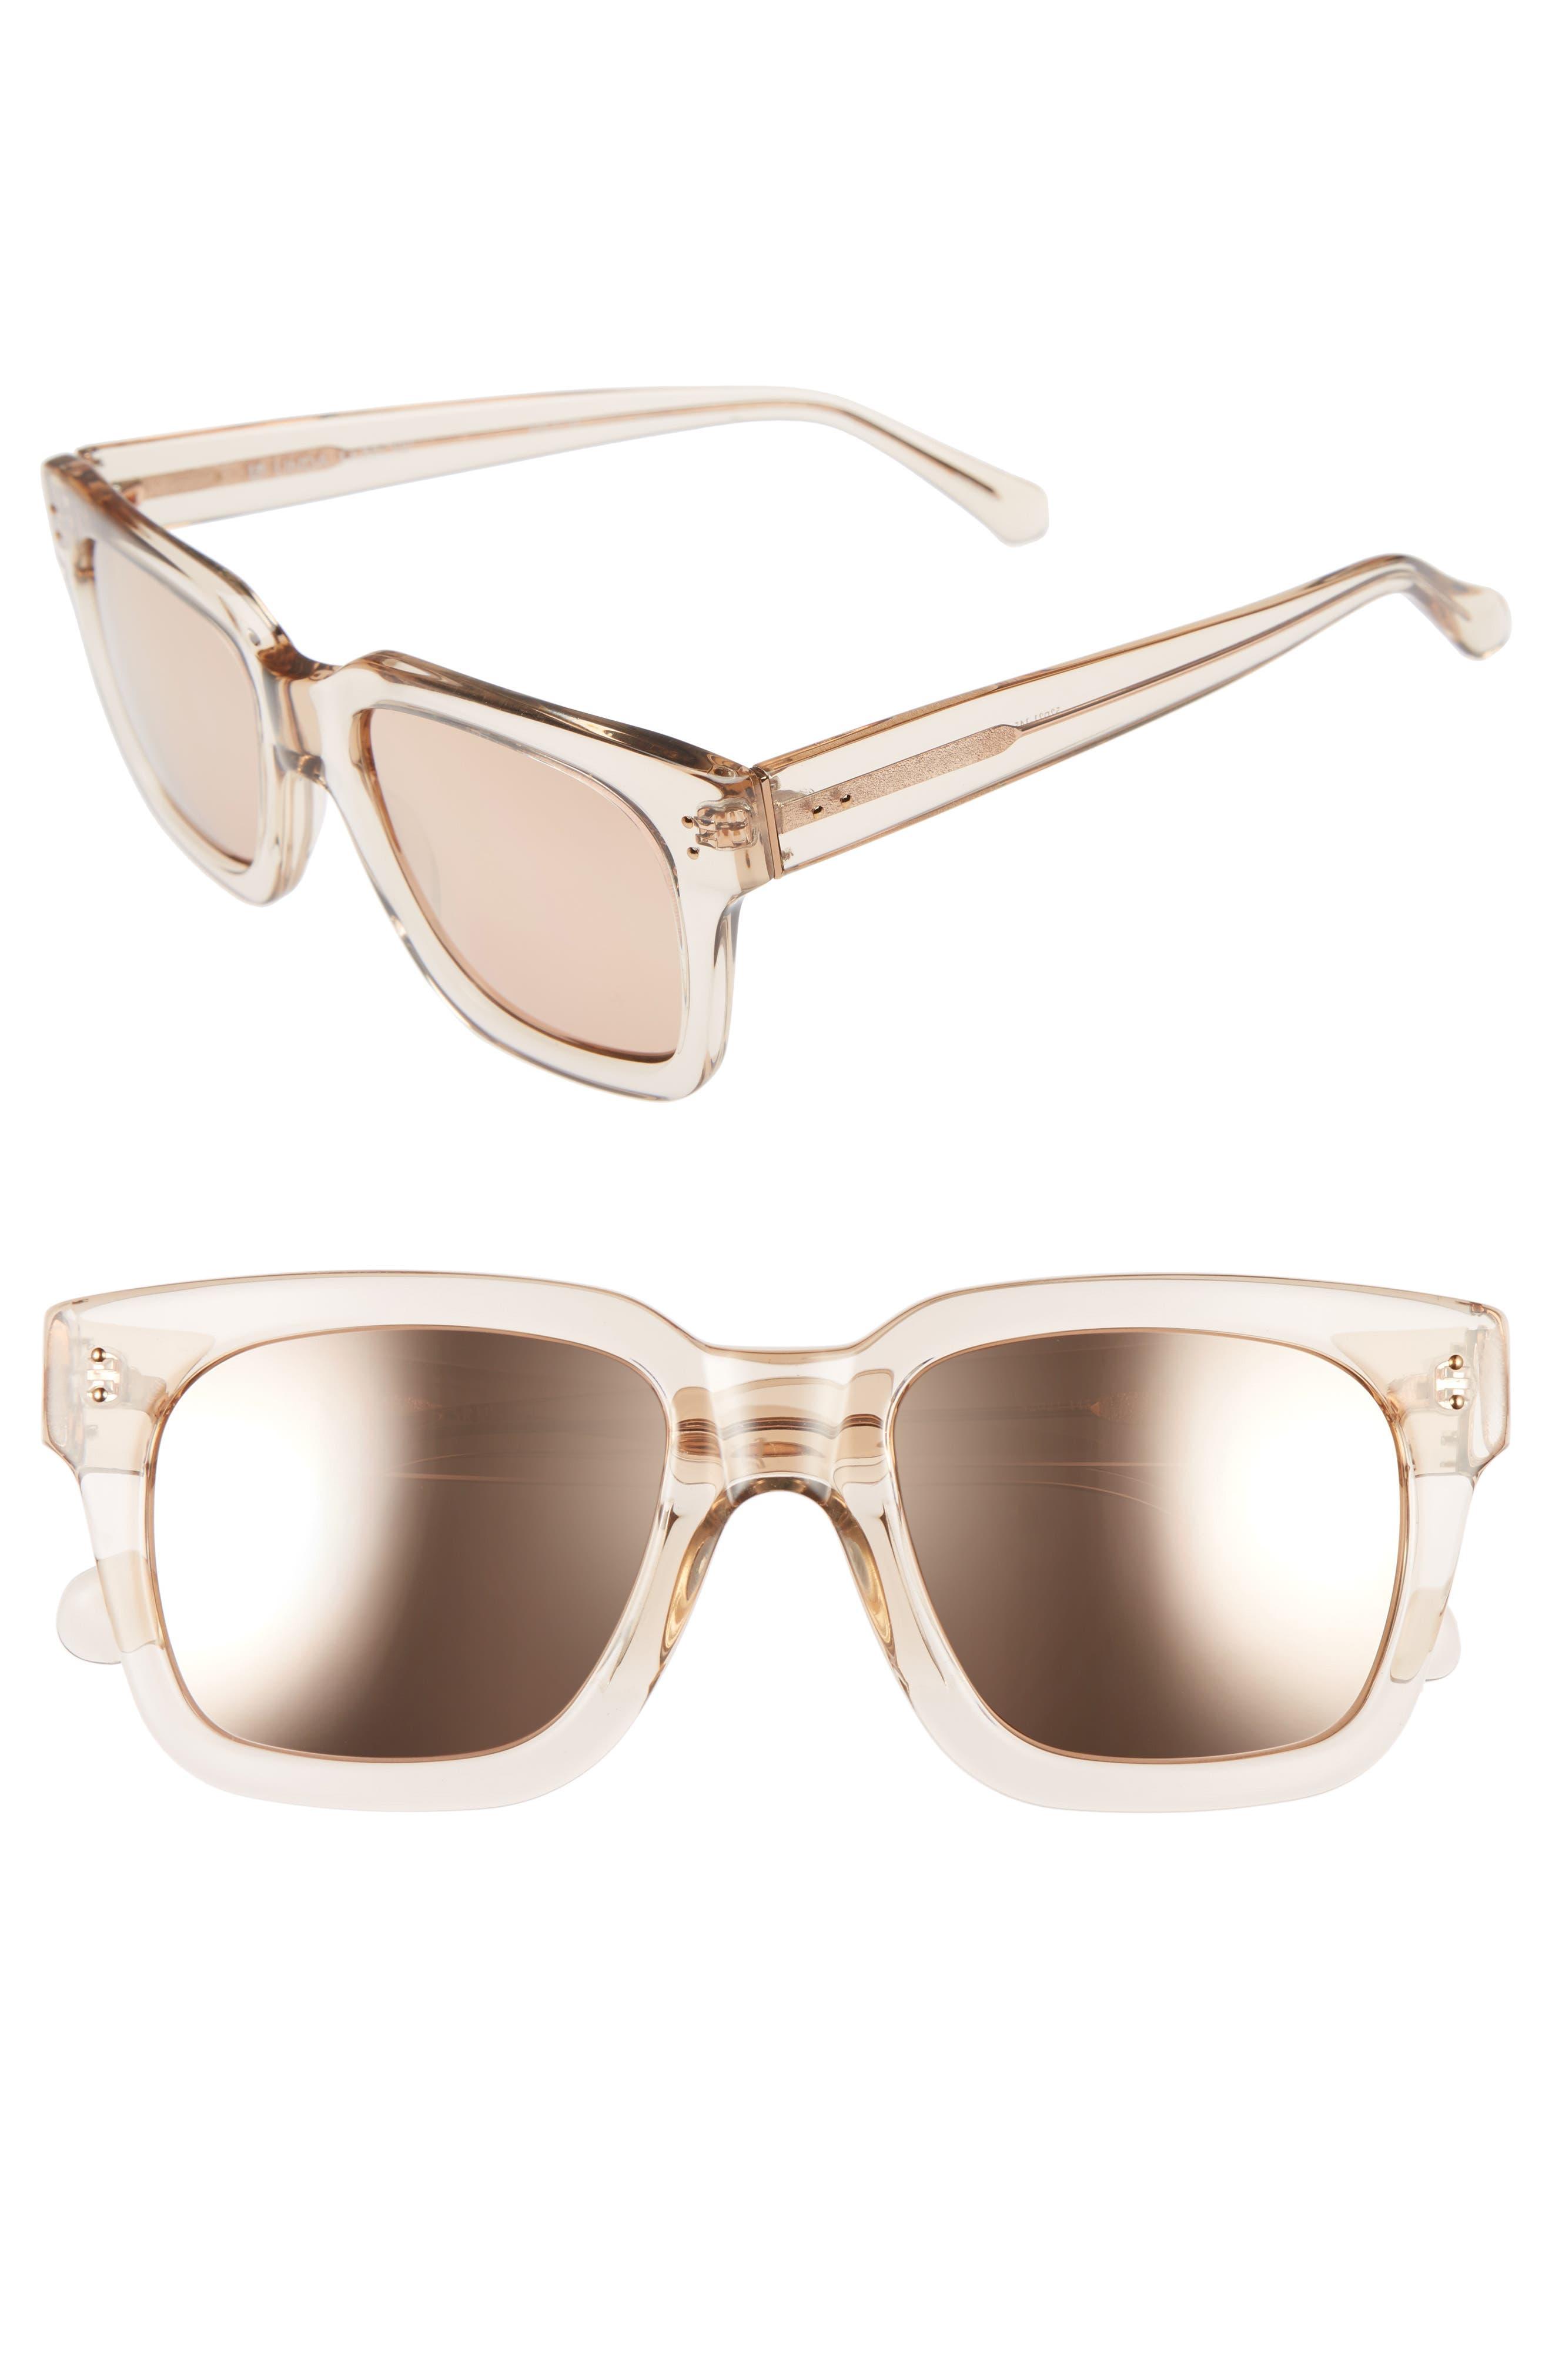 50mm Sunglasses,                         Main,                         color, 020